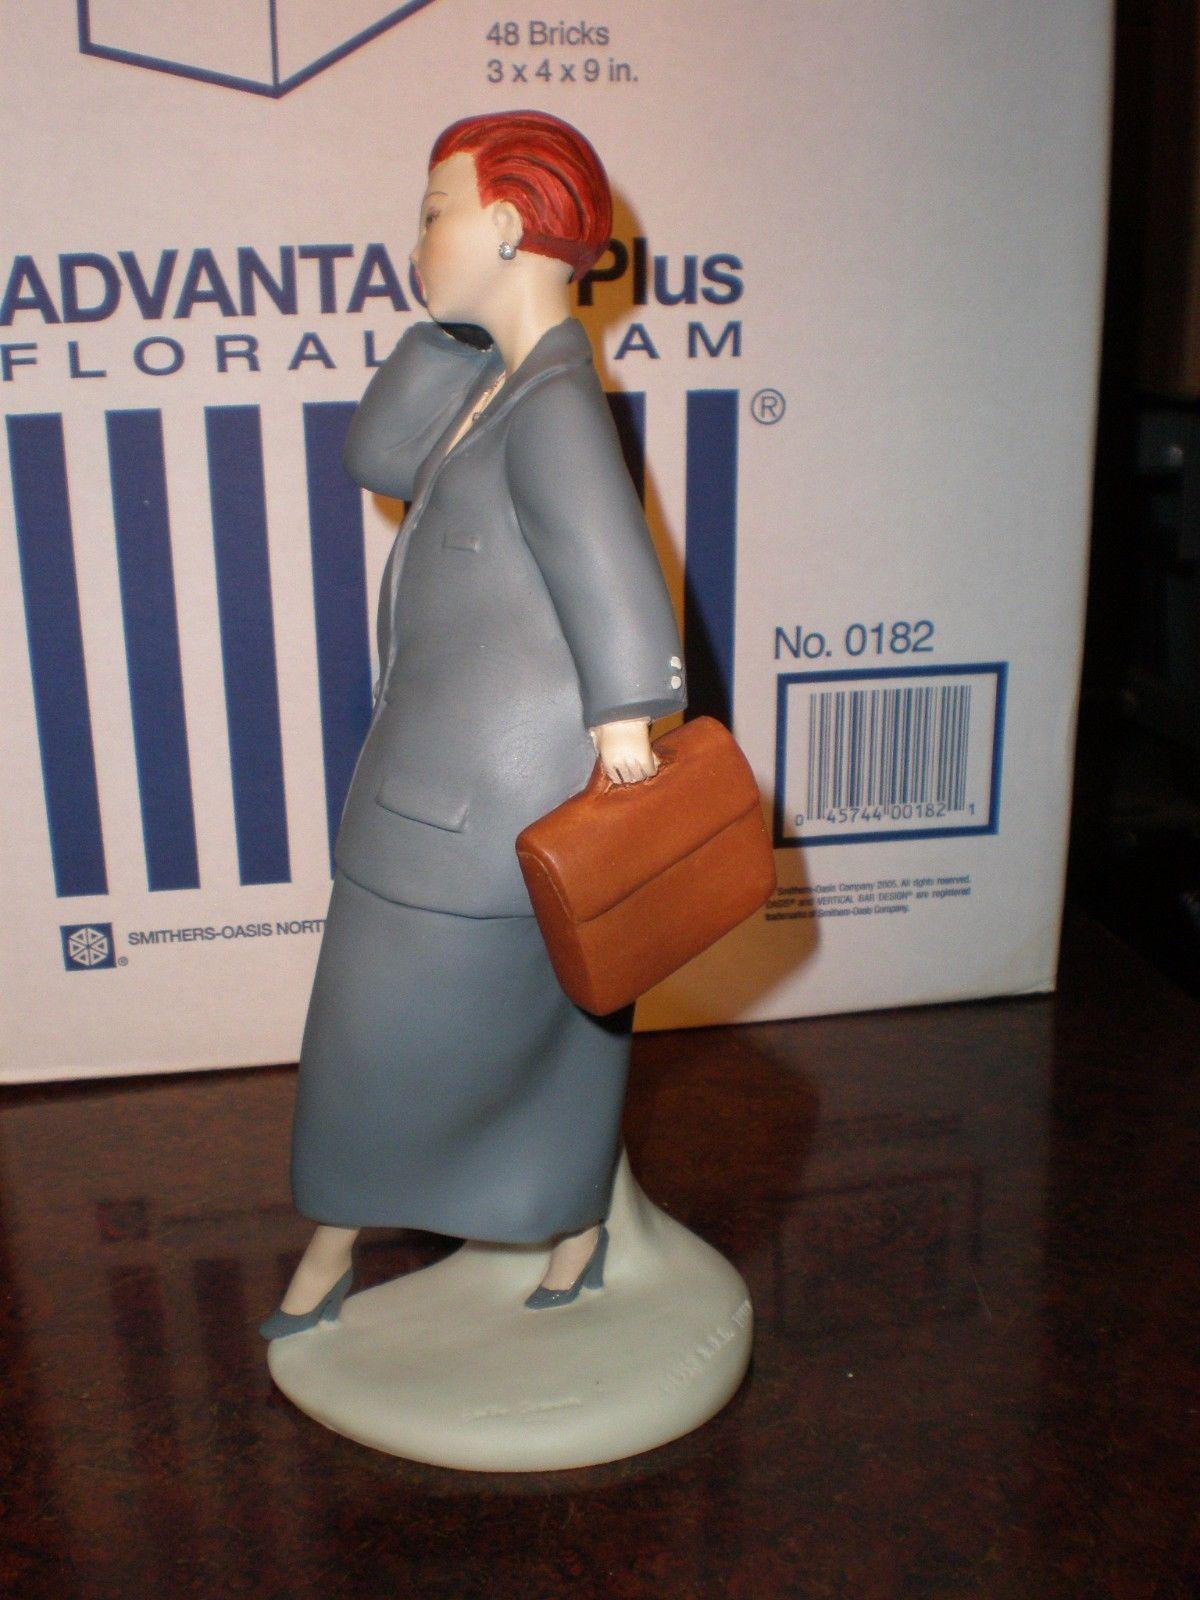 Chubby nurse figurine and